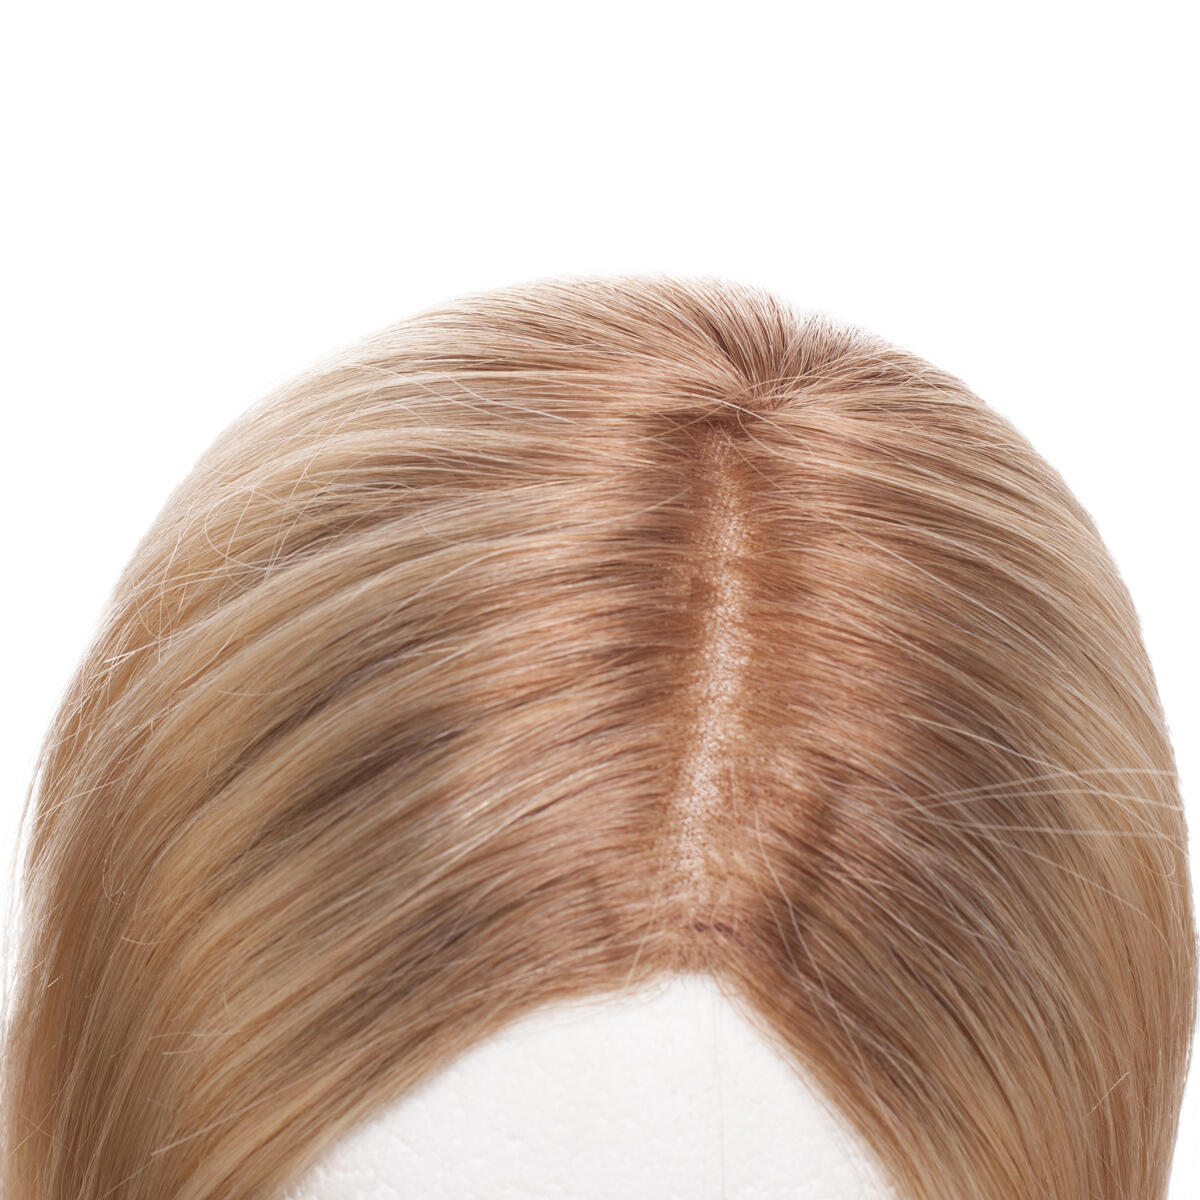 Top Piece R7.5/8.3 Ash Brown Honey Blonde 30 cm